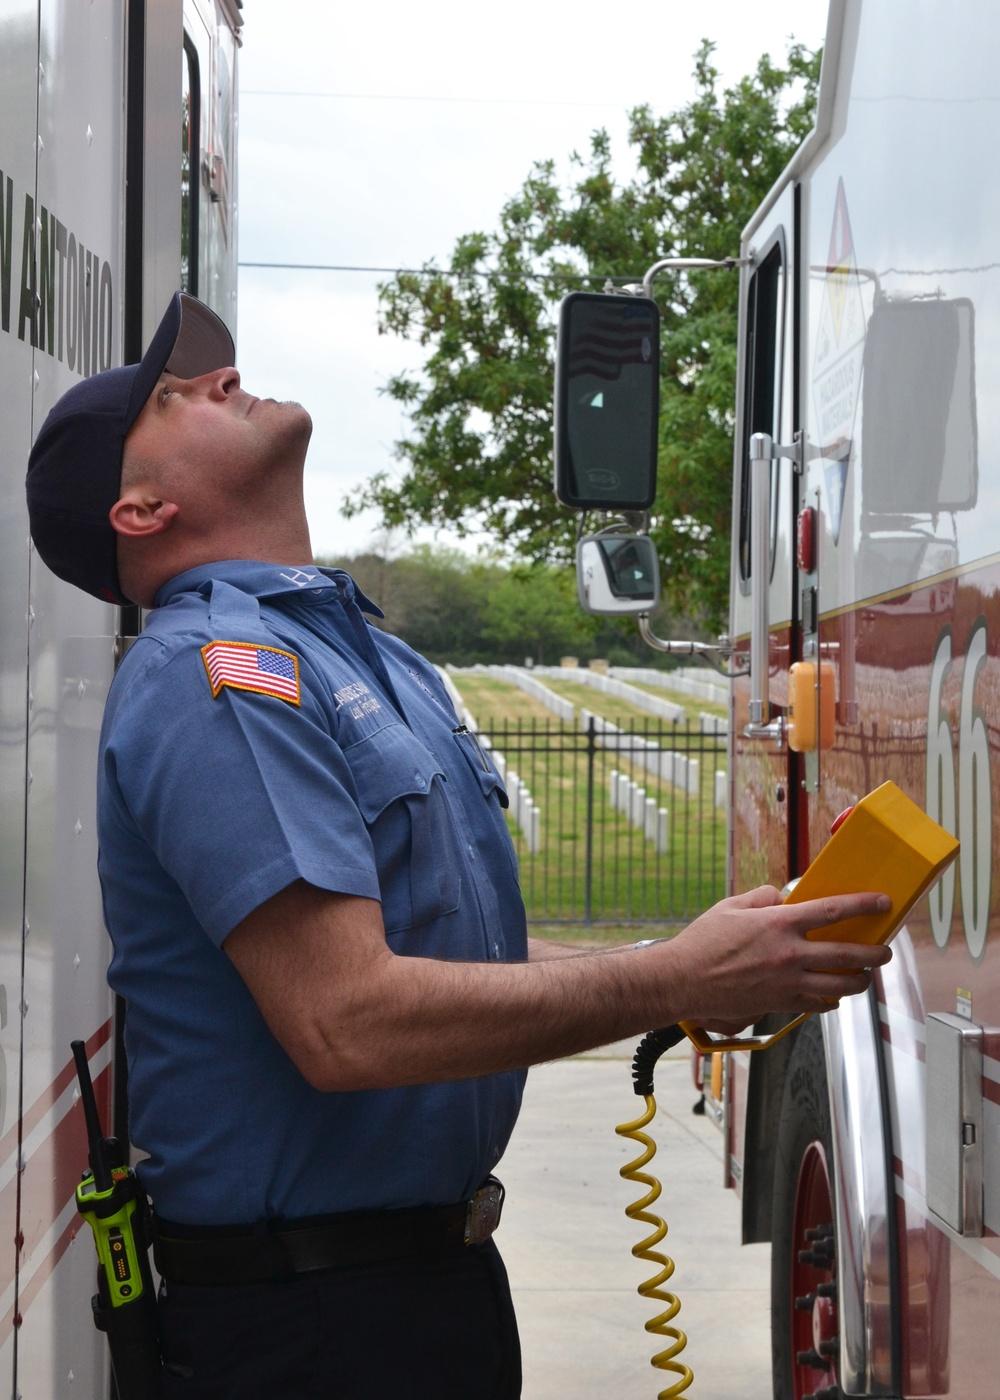 JBSA hazmat team prepares new apparatus for consolidated service